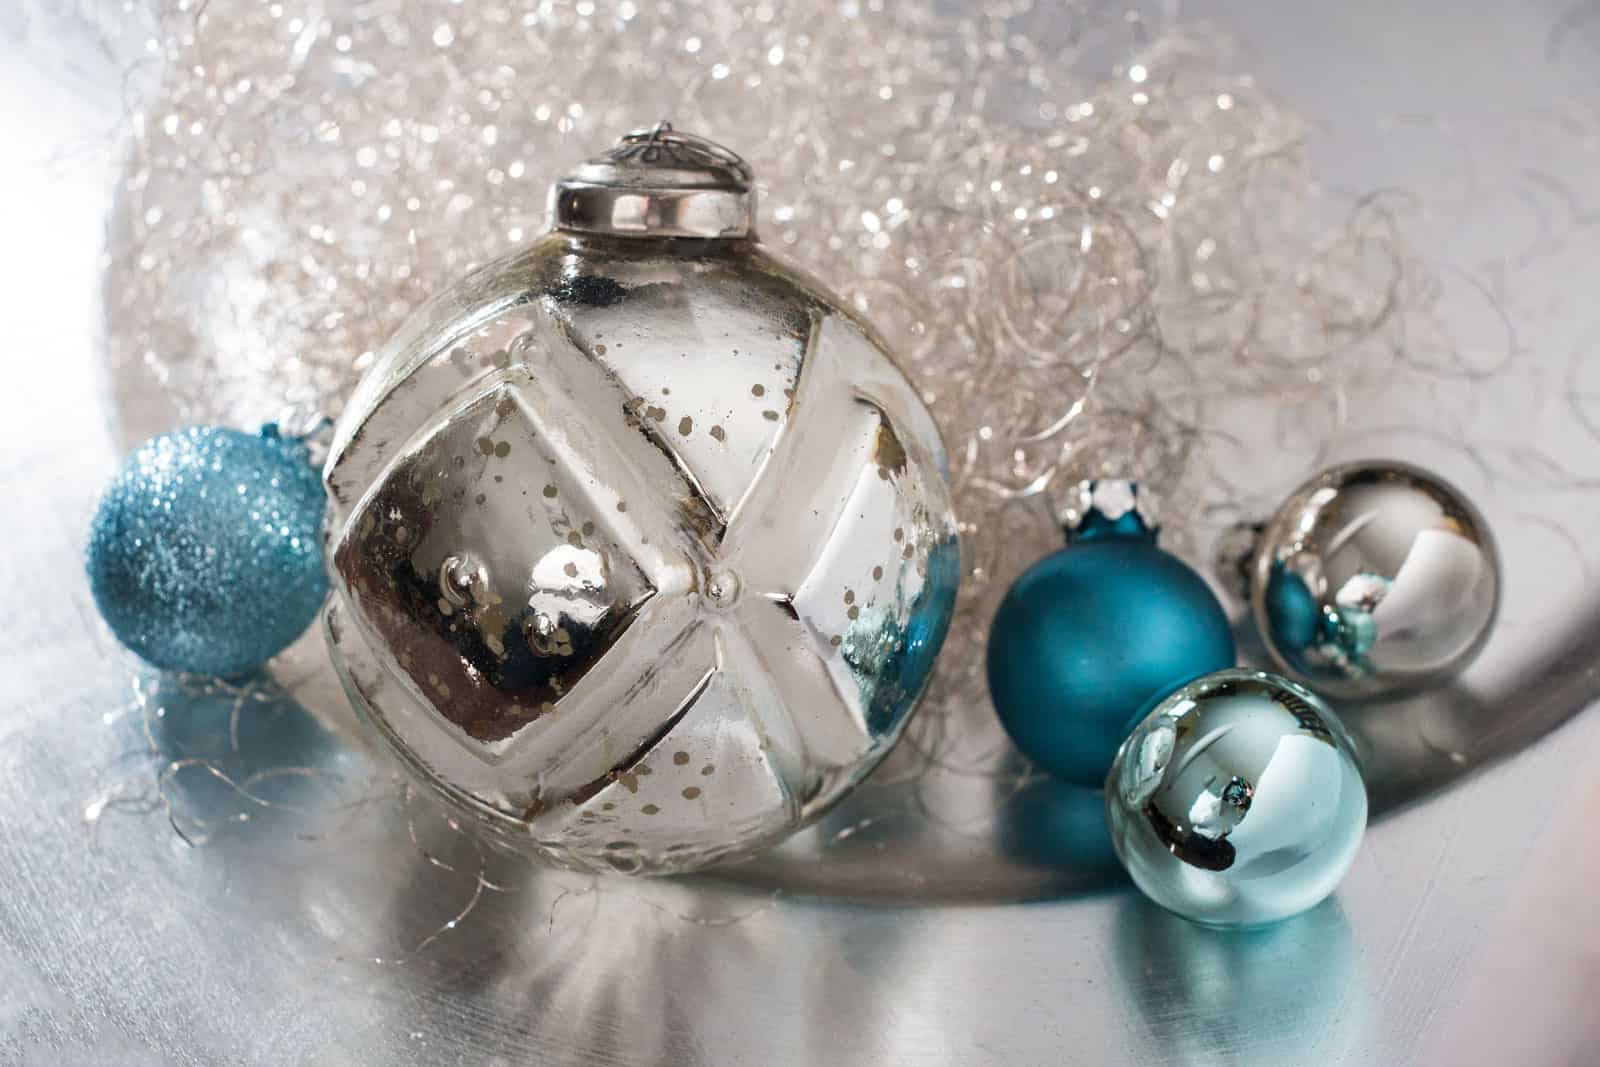 Weihnachtskugeln blau christbaumkugeln in blaut nen for Christbaumkugeln lila silber